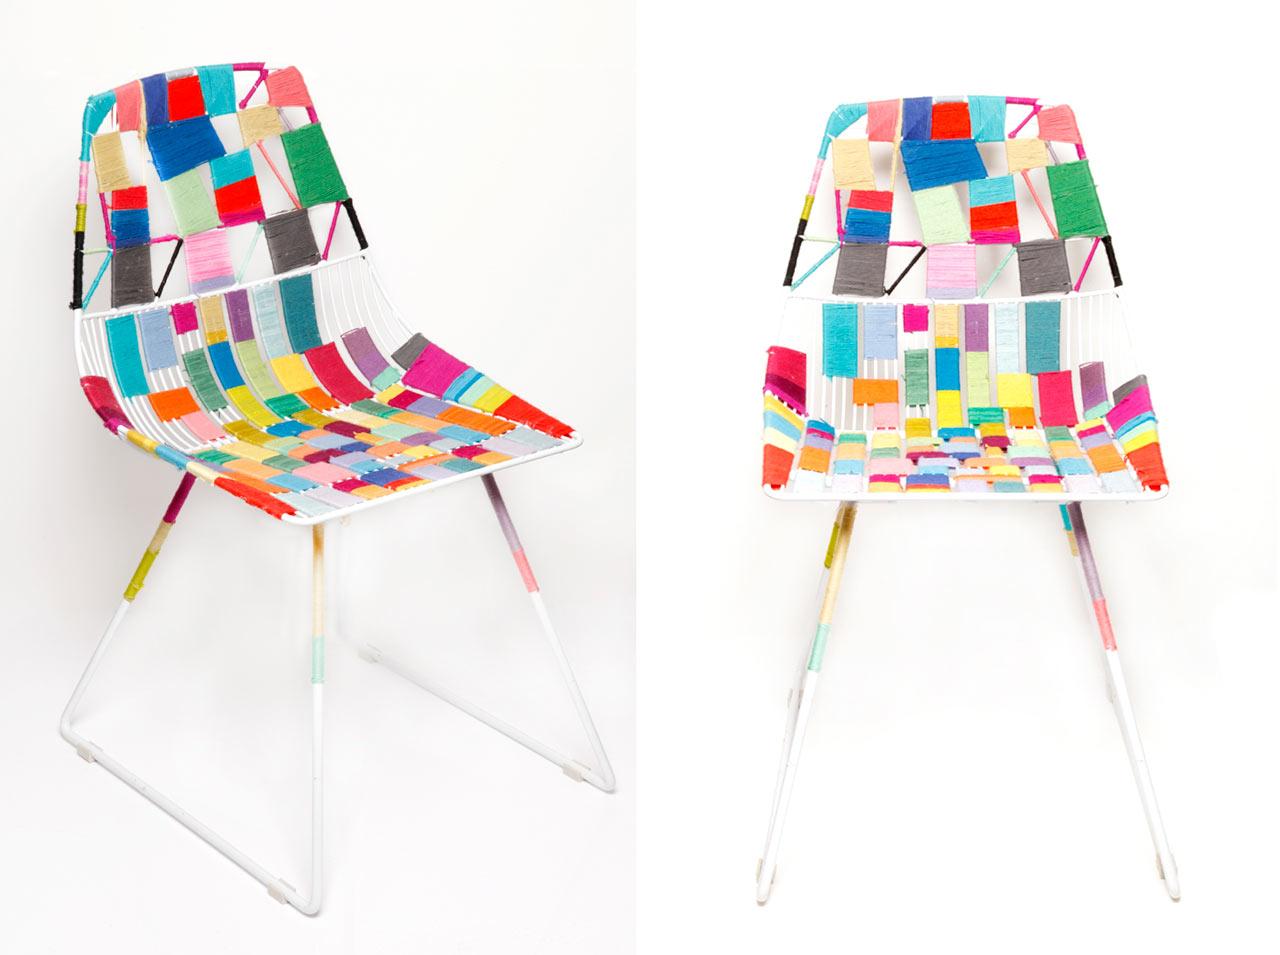 Edward-Granger-Bend-Lucy-Chair-1